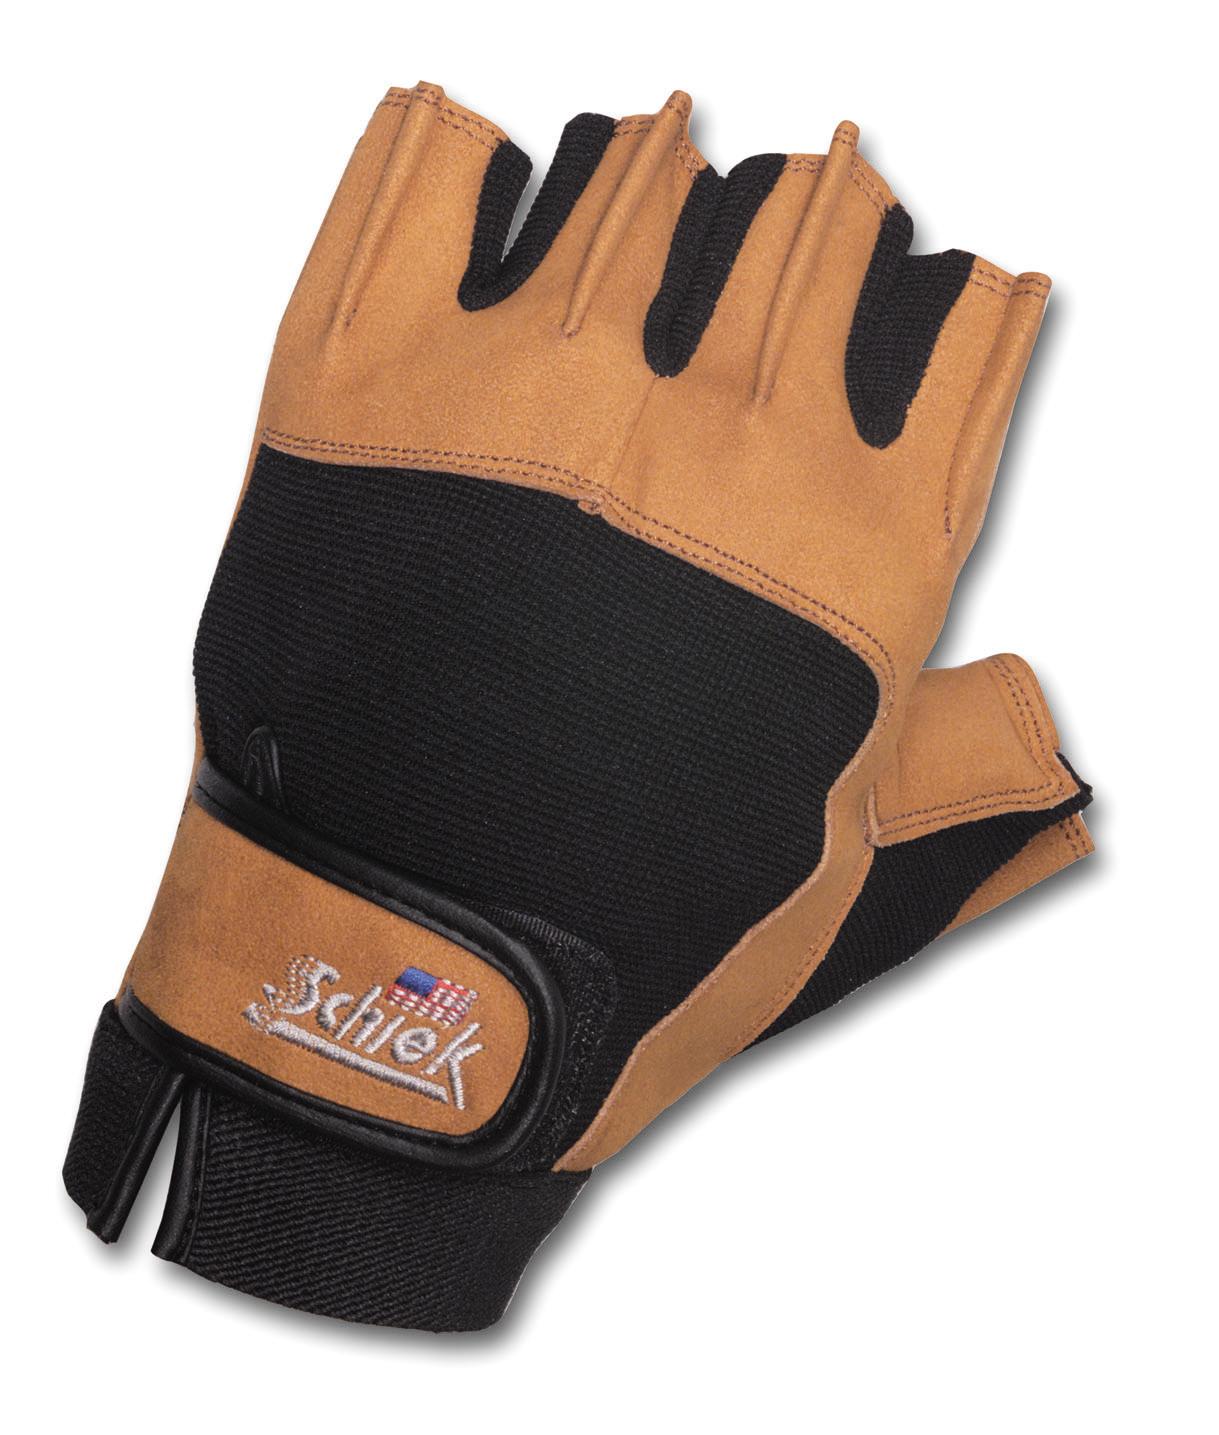 Schiek 415 Power Lifting Gloves